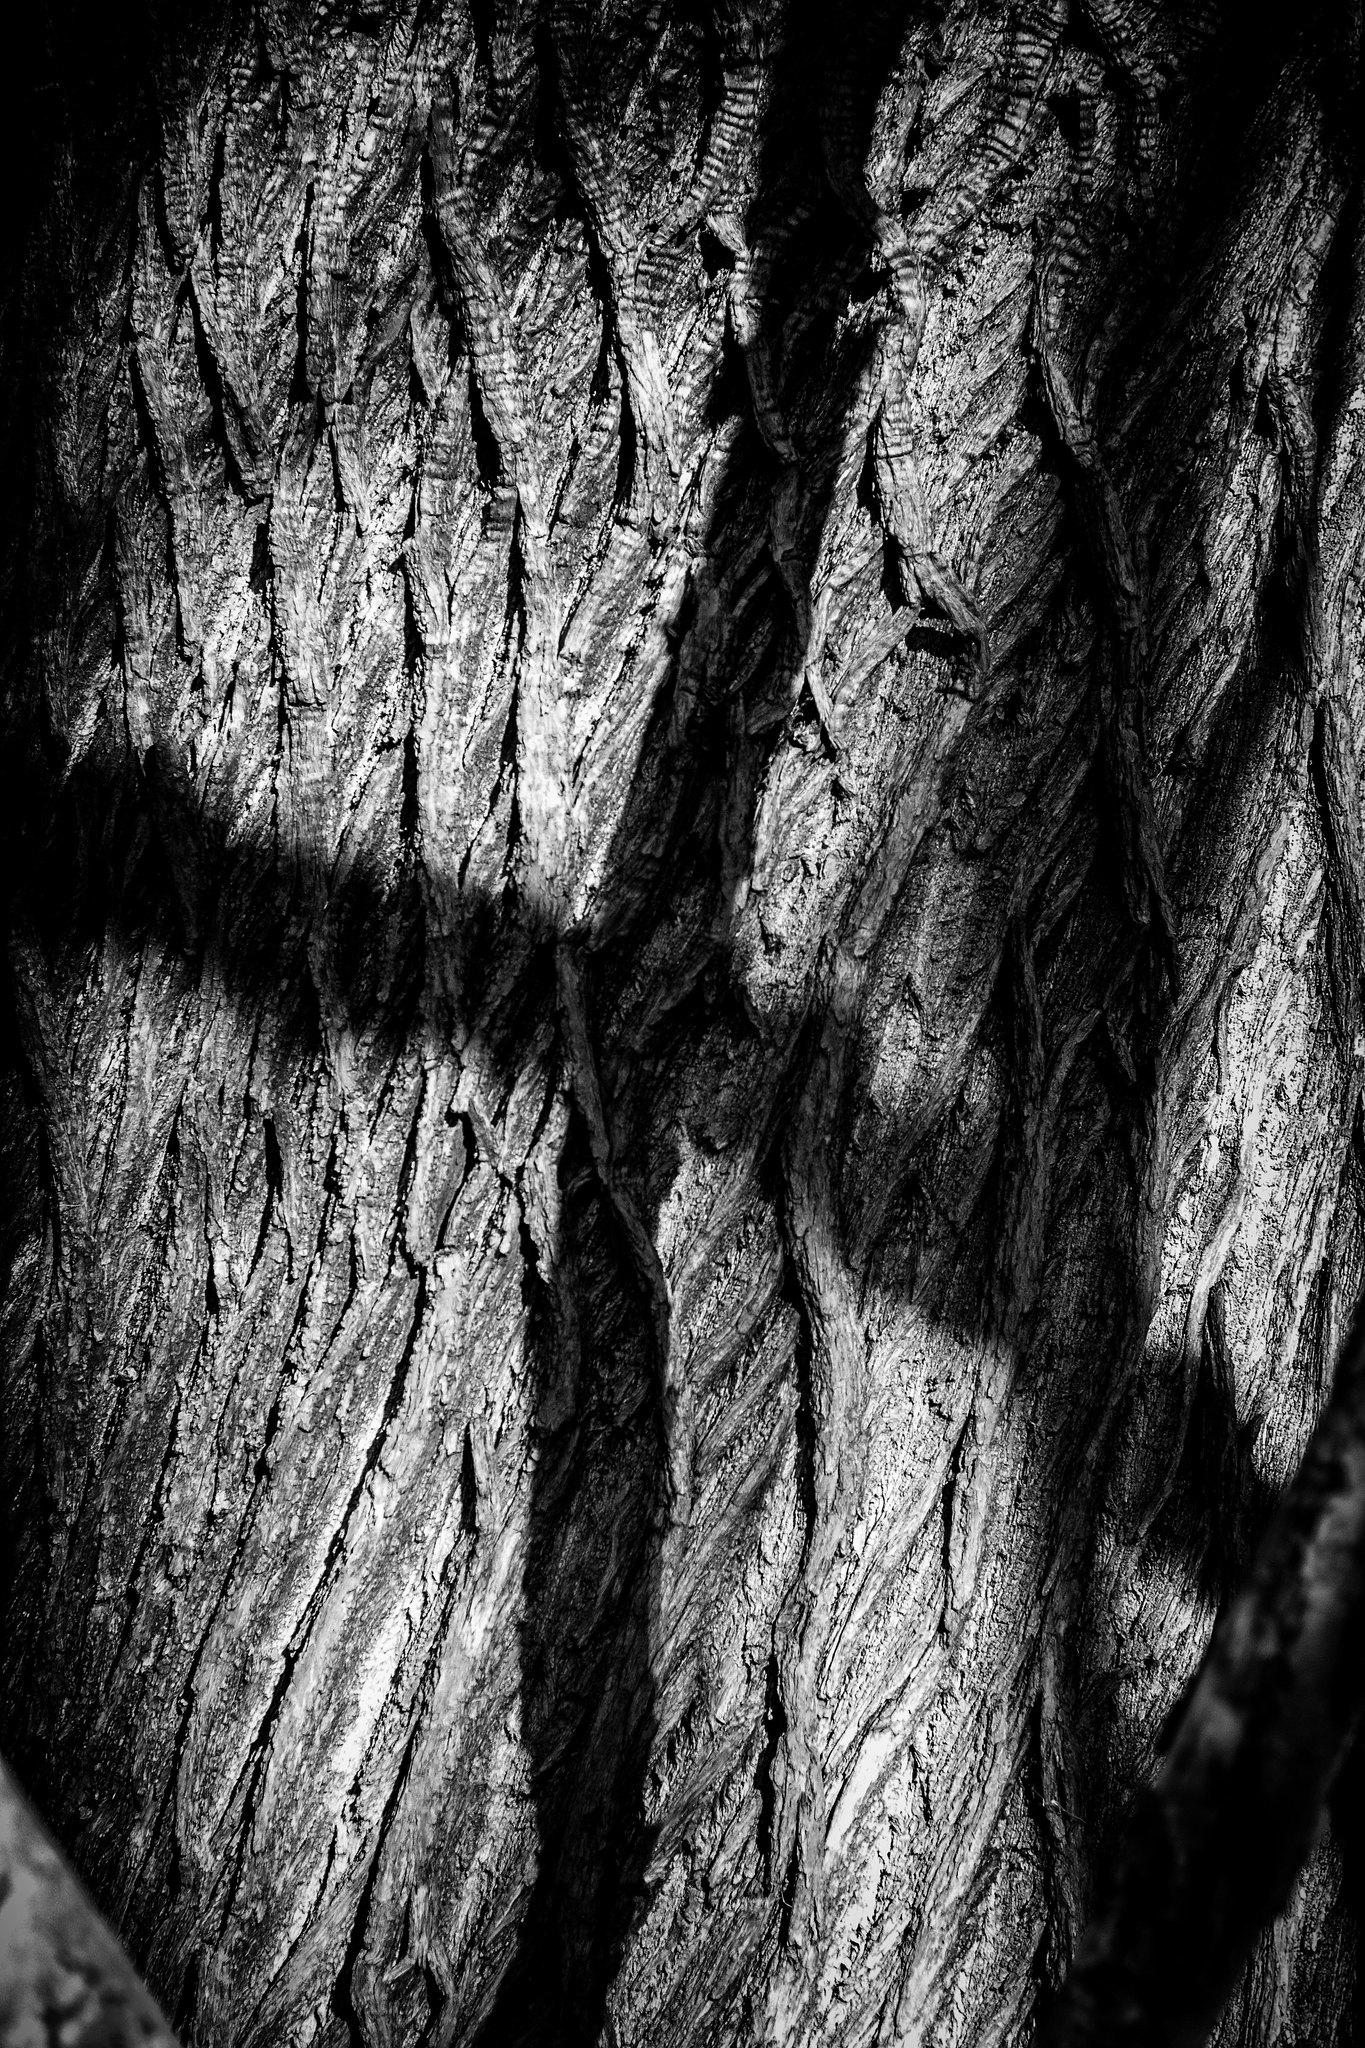 Criss Cross Tree